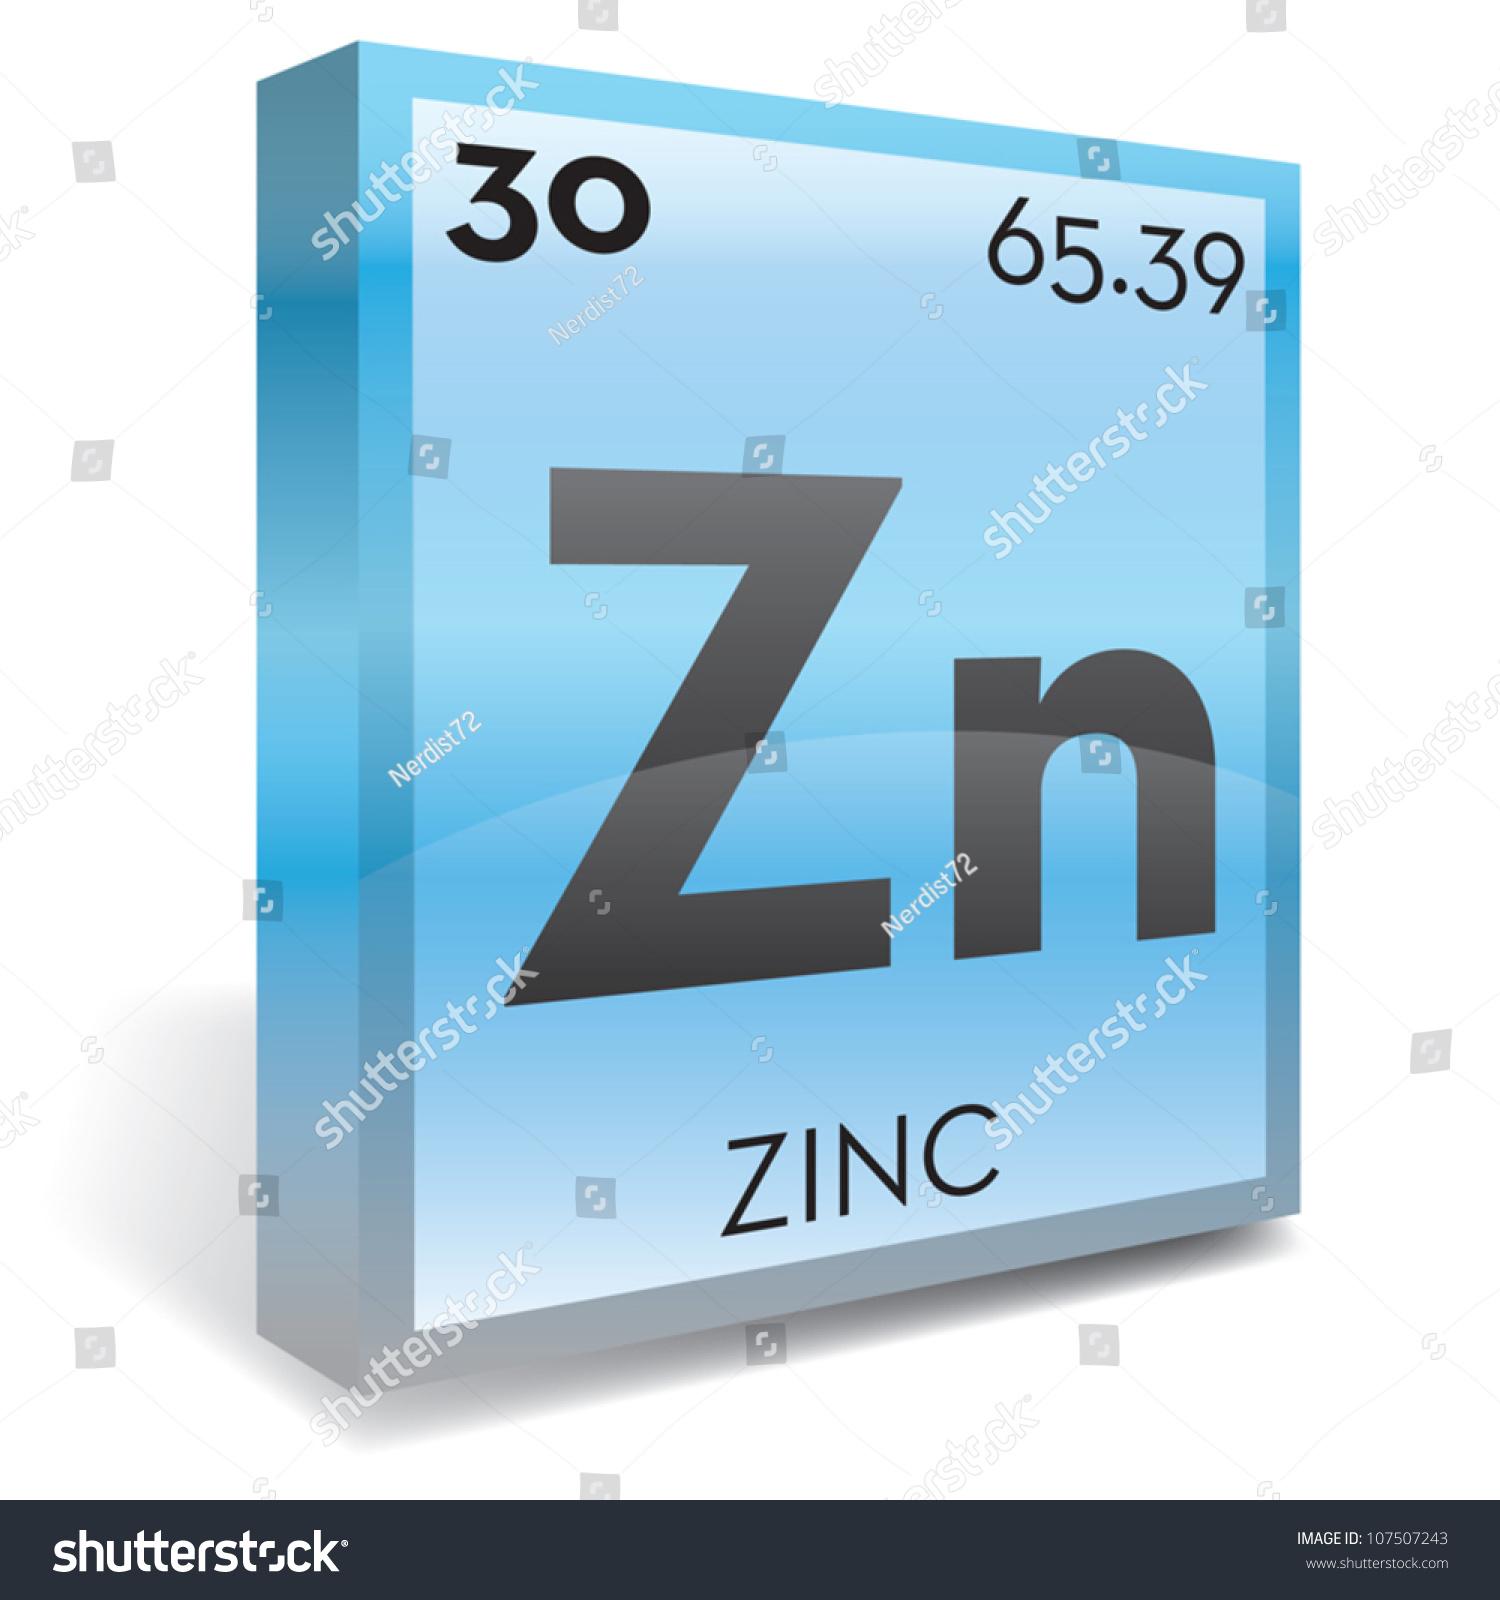 Zinc element periodic table stock vector 107507243 shutterstock zinc element periodic table gamestrikefo Gallery